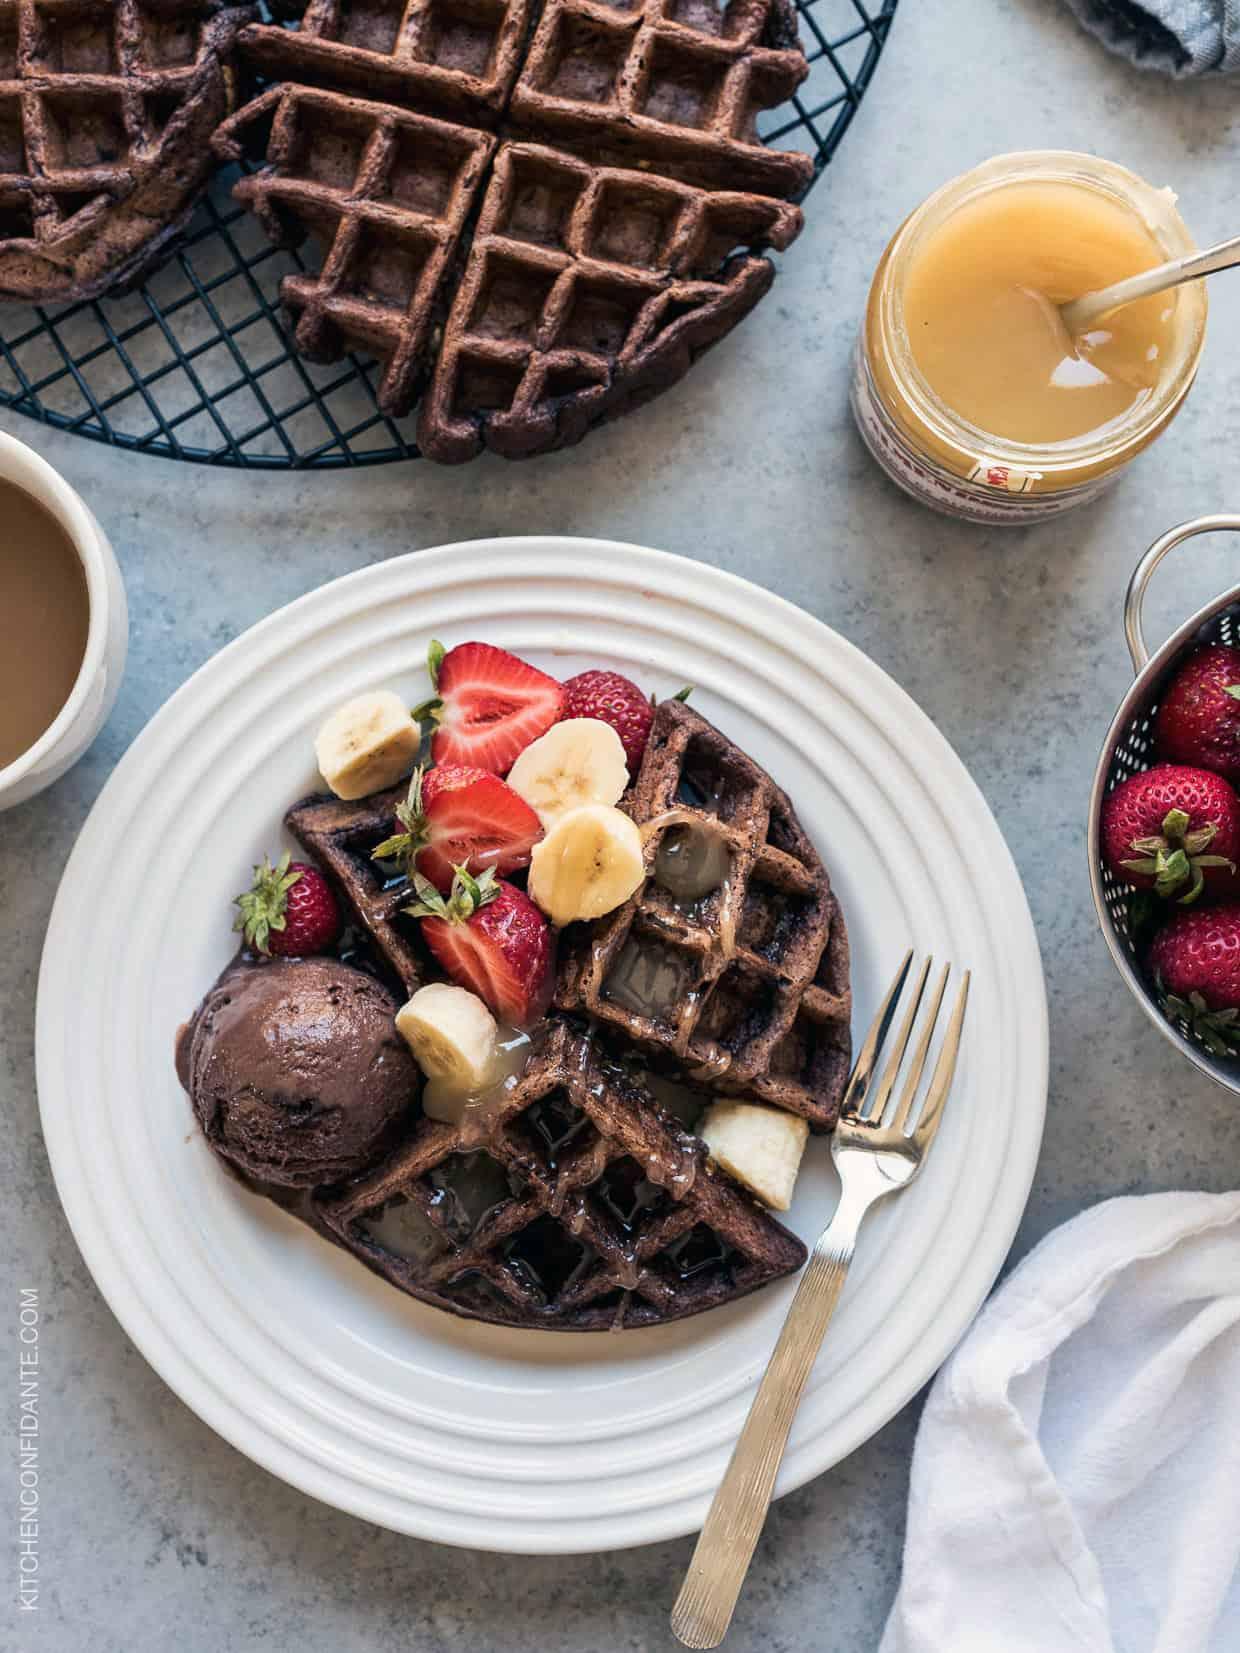 Chocolate Zucchini Belgian Waffles